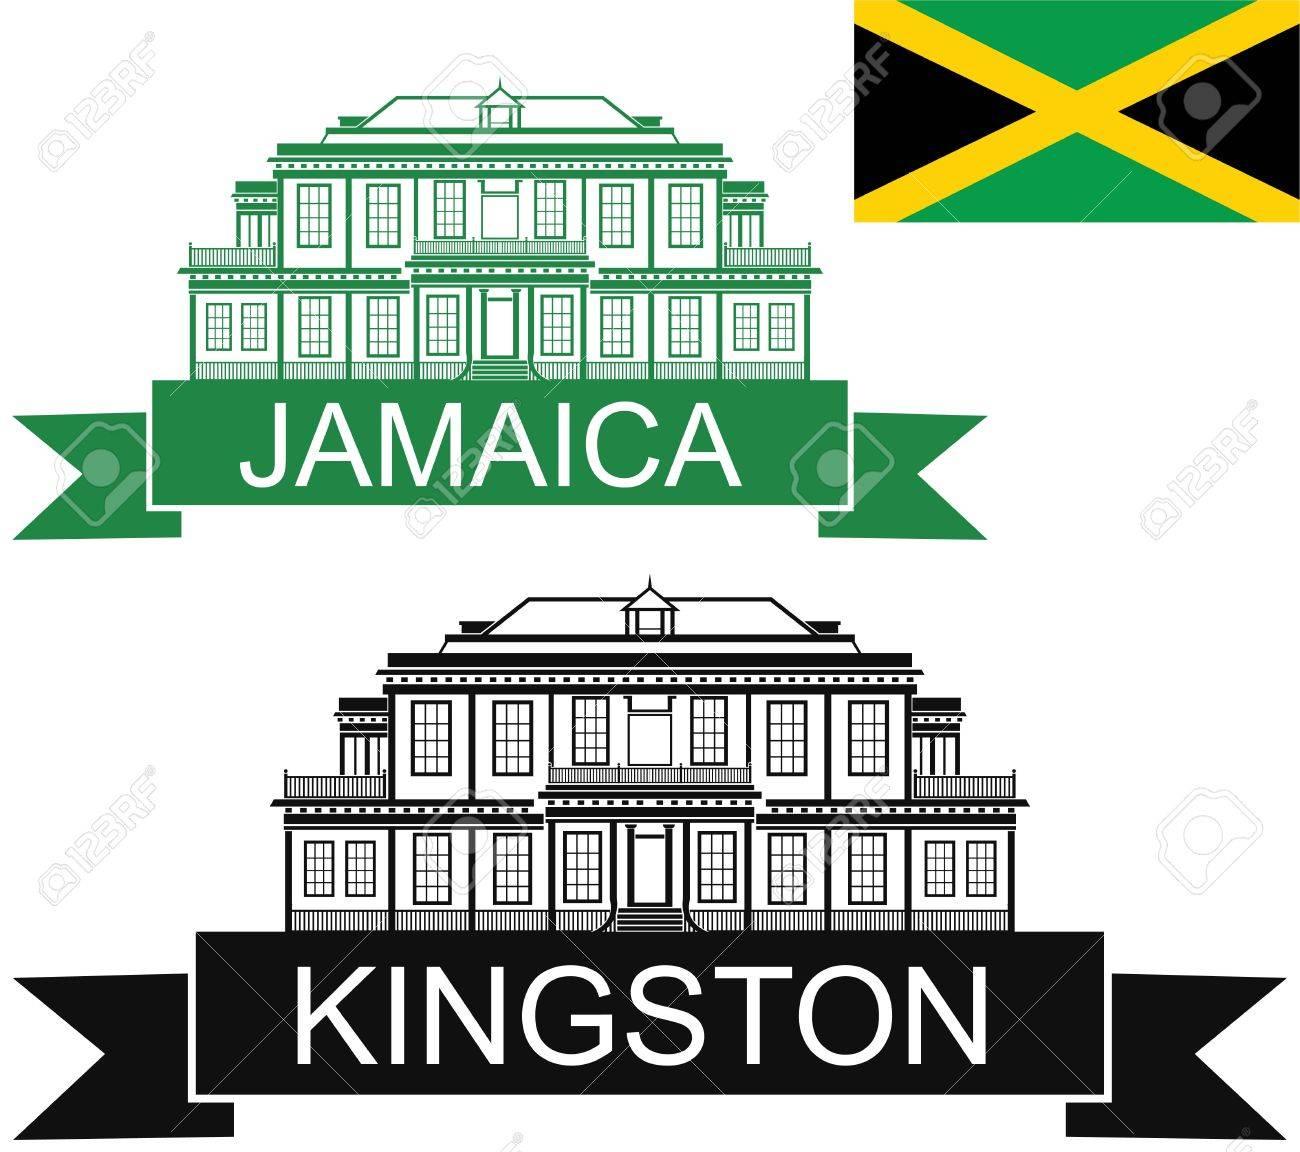 Image result for jamaica, Kingston clipart